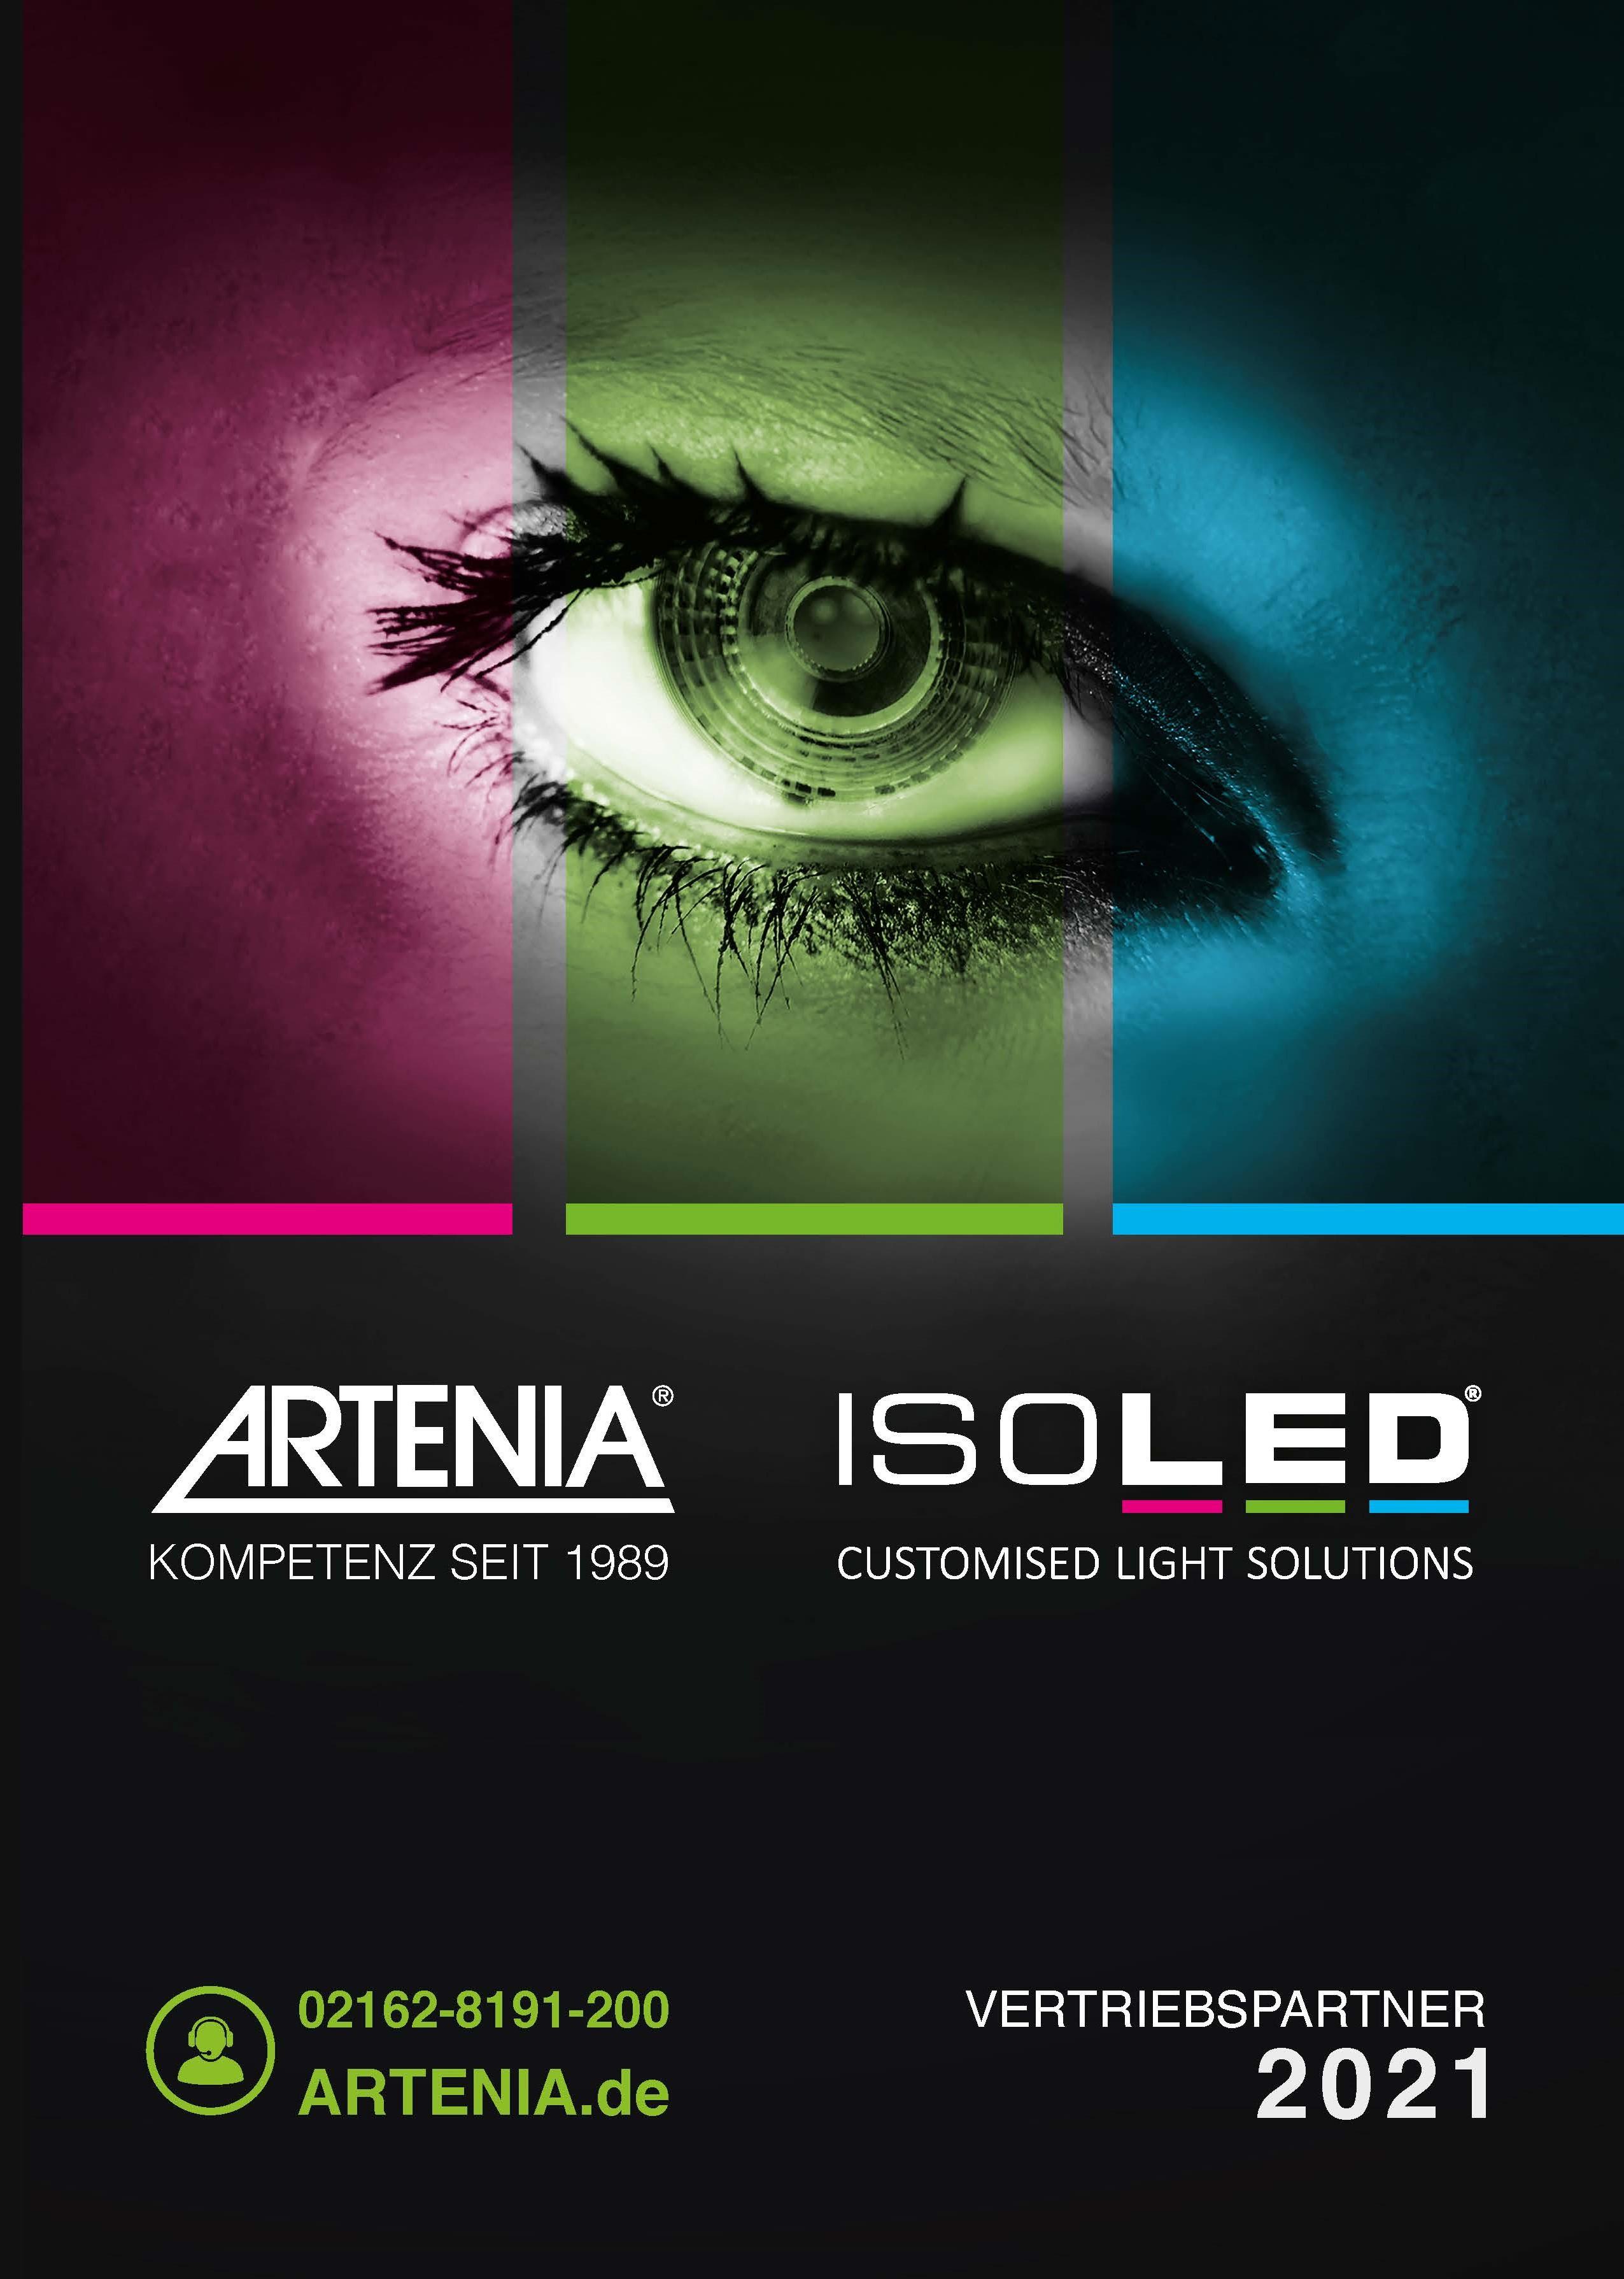 2021_artenia_isoled_katalog_deutsch-cover-16